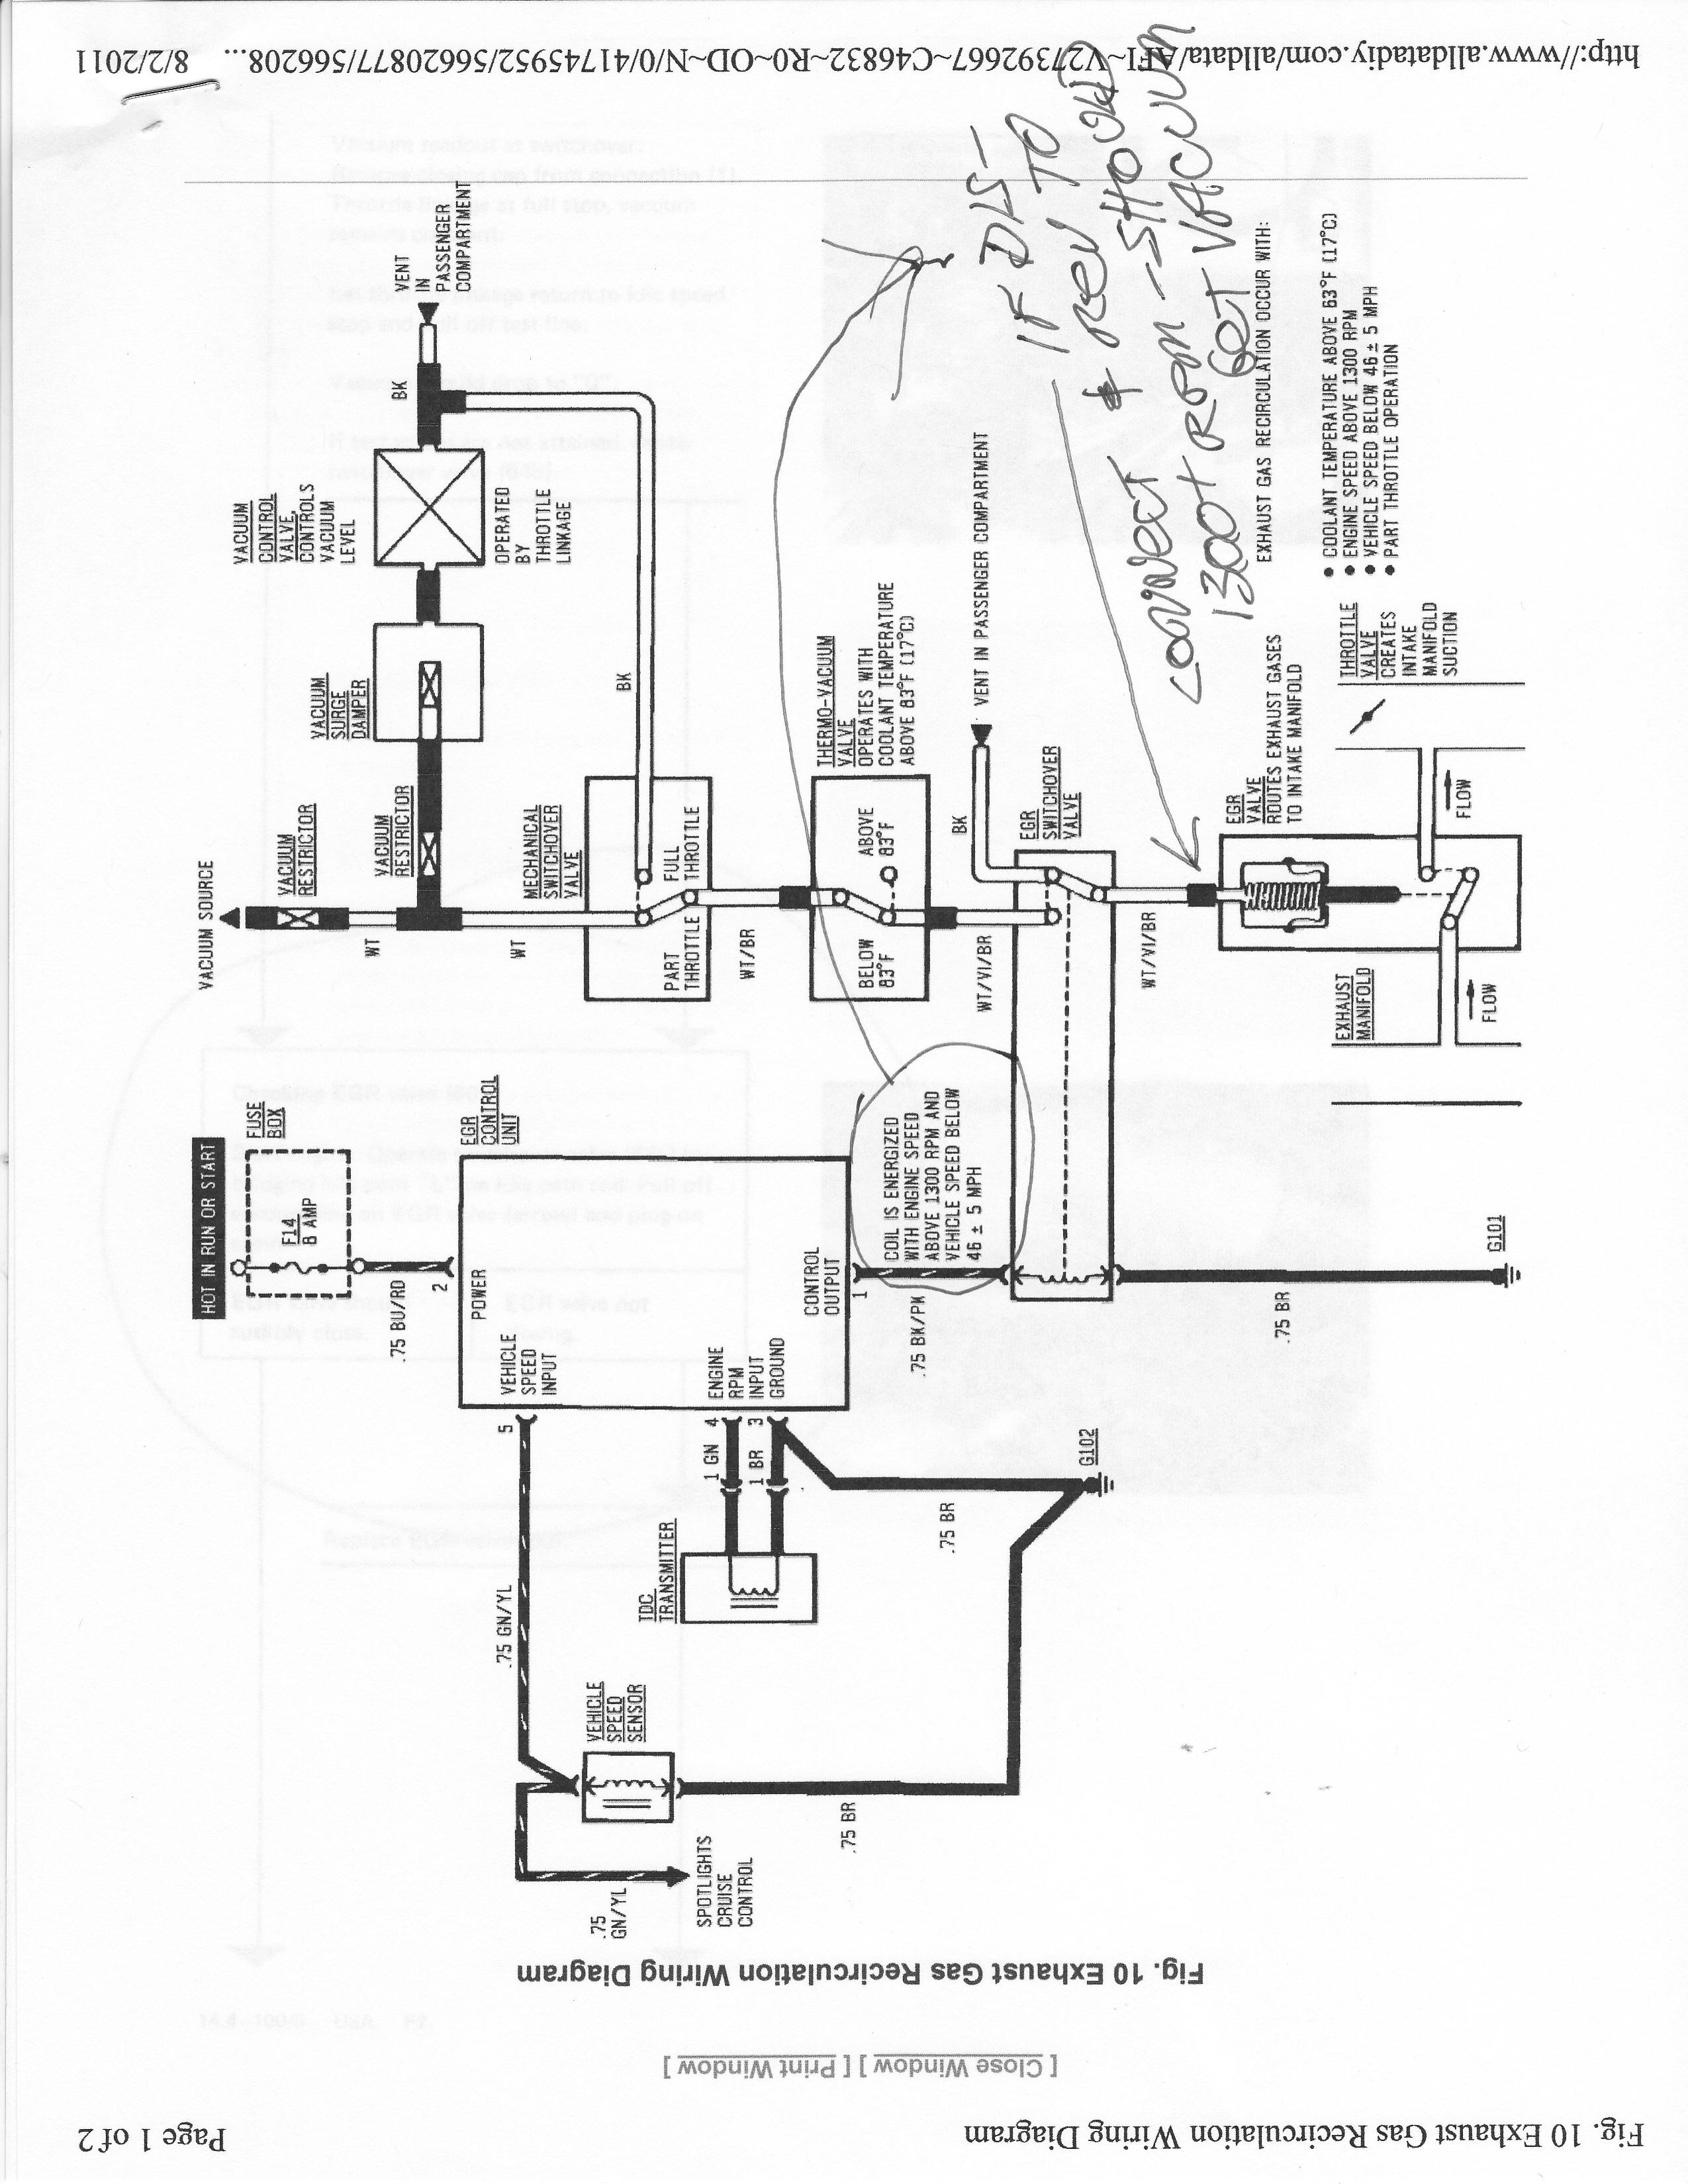 mercedes benz sprinter wiring diagram 12 inch kicker cvr parts catalog imageresizertool com